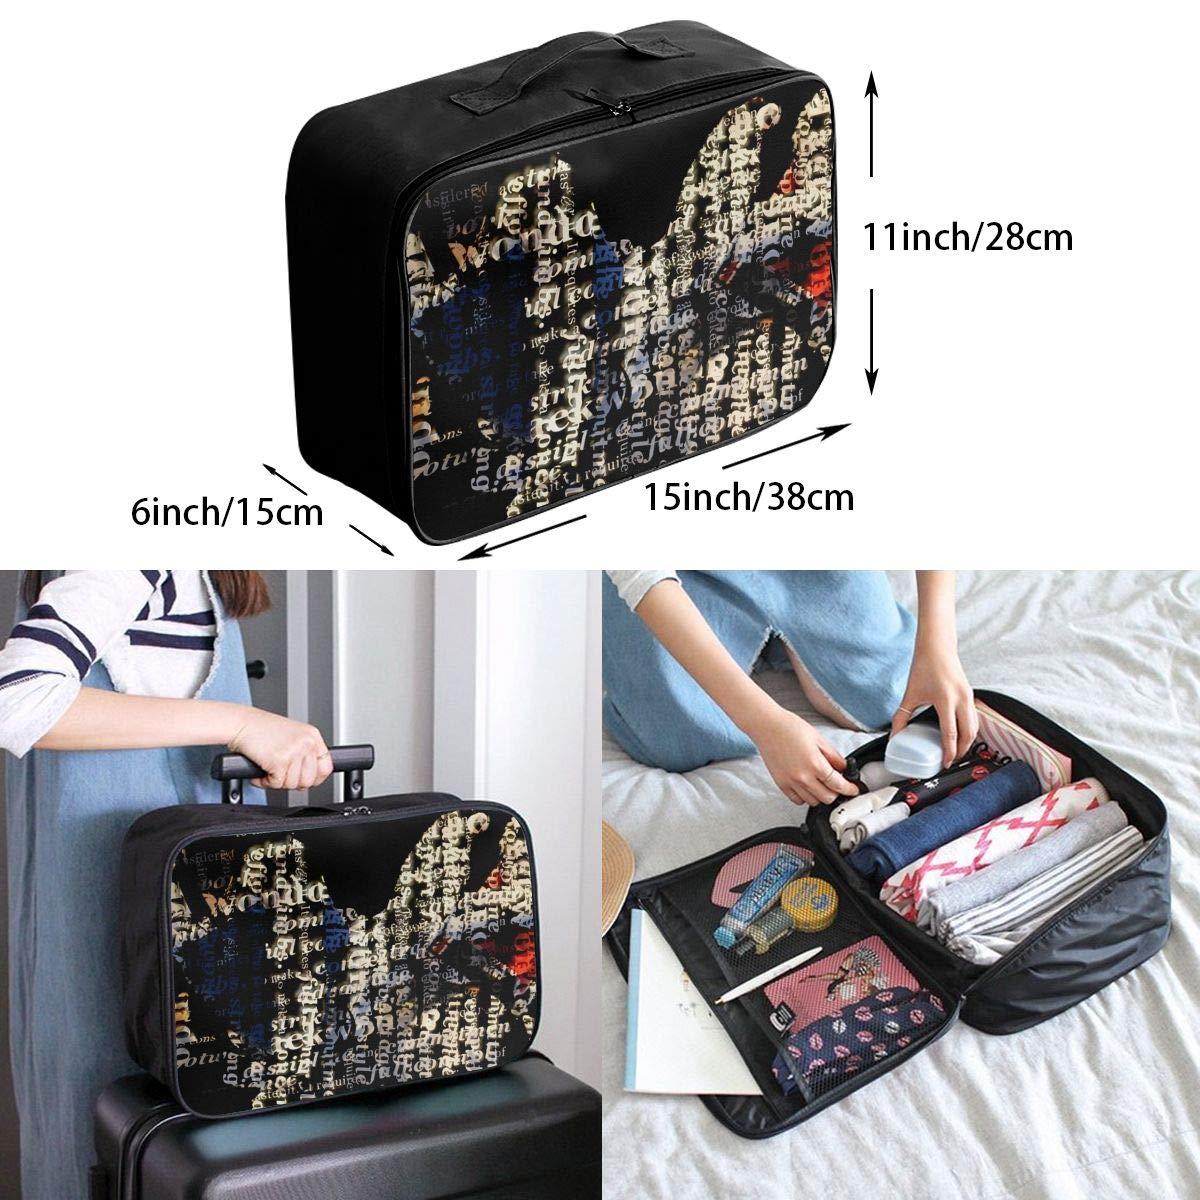 Travel Luggage Duffle Bag Lightweight Portable Handbag Taekwondo Large Capacity Waterproof Foldable Storage Tote